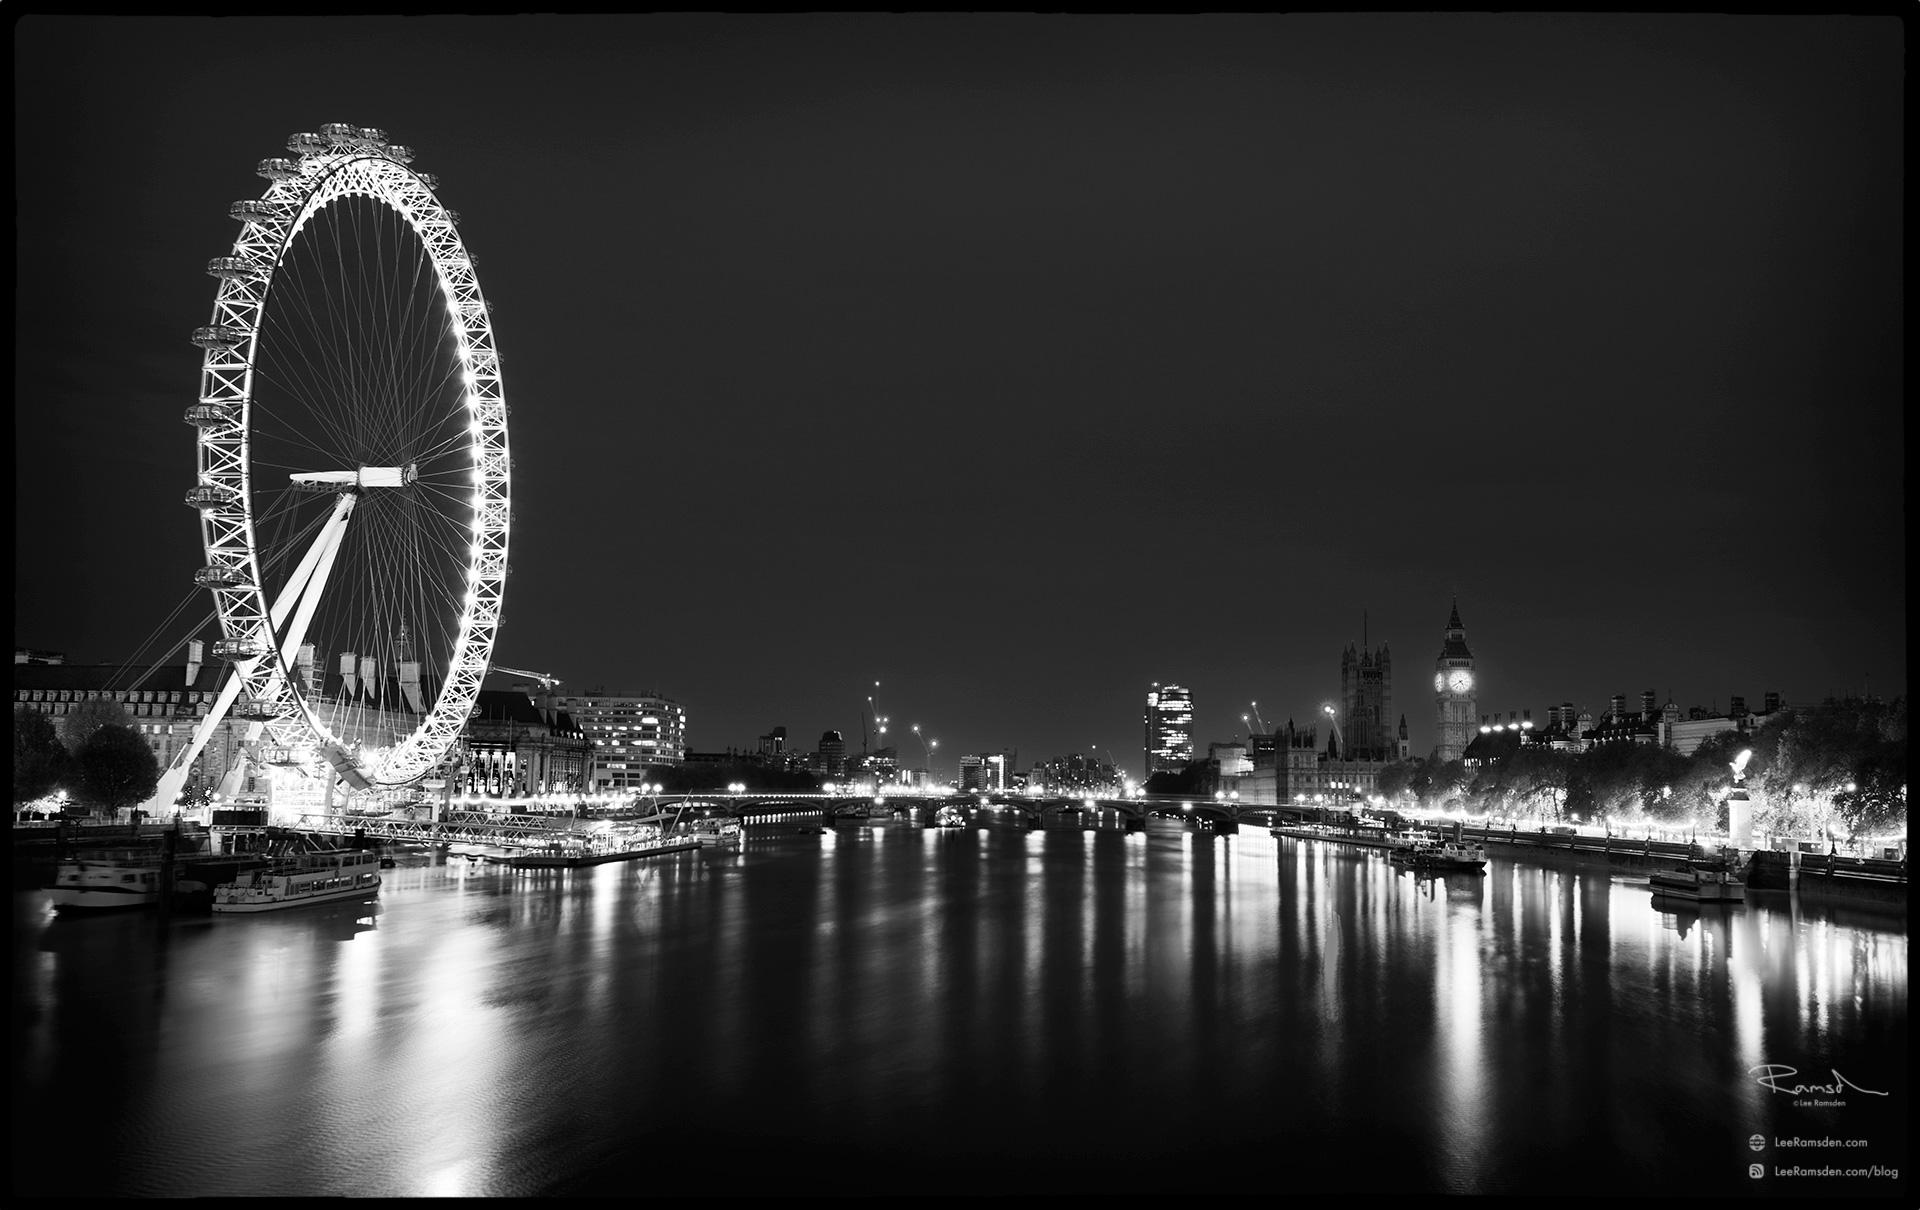 "<img src=""Big Ben"" alt=""London eye river thames london bridge long exposure lee filters lee ramsden monochrome black and white fine art"">"